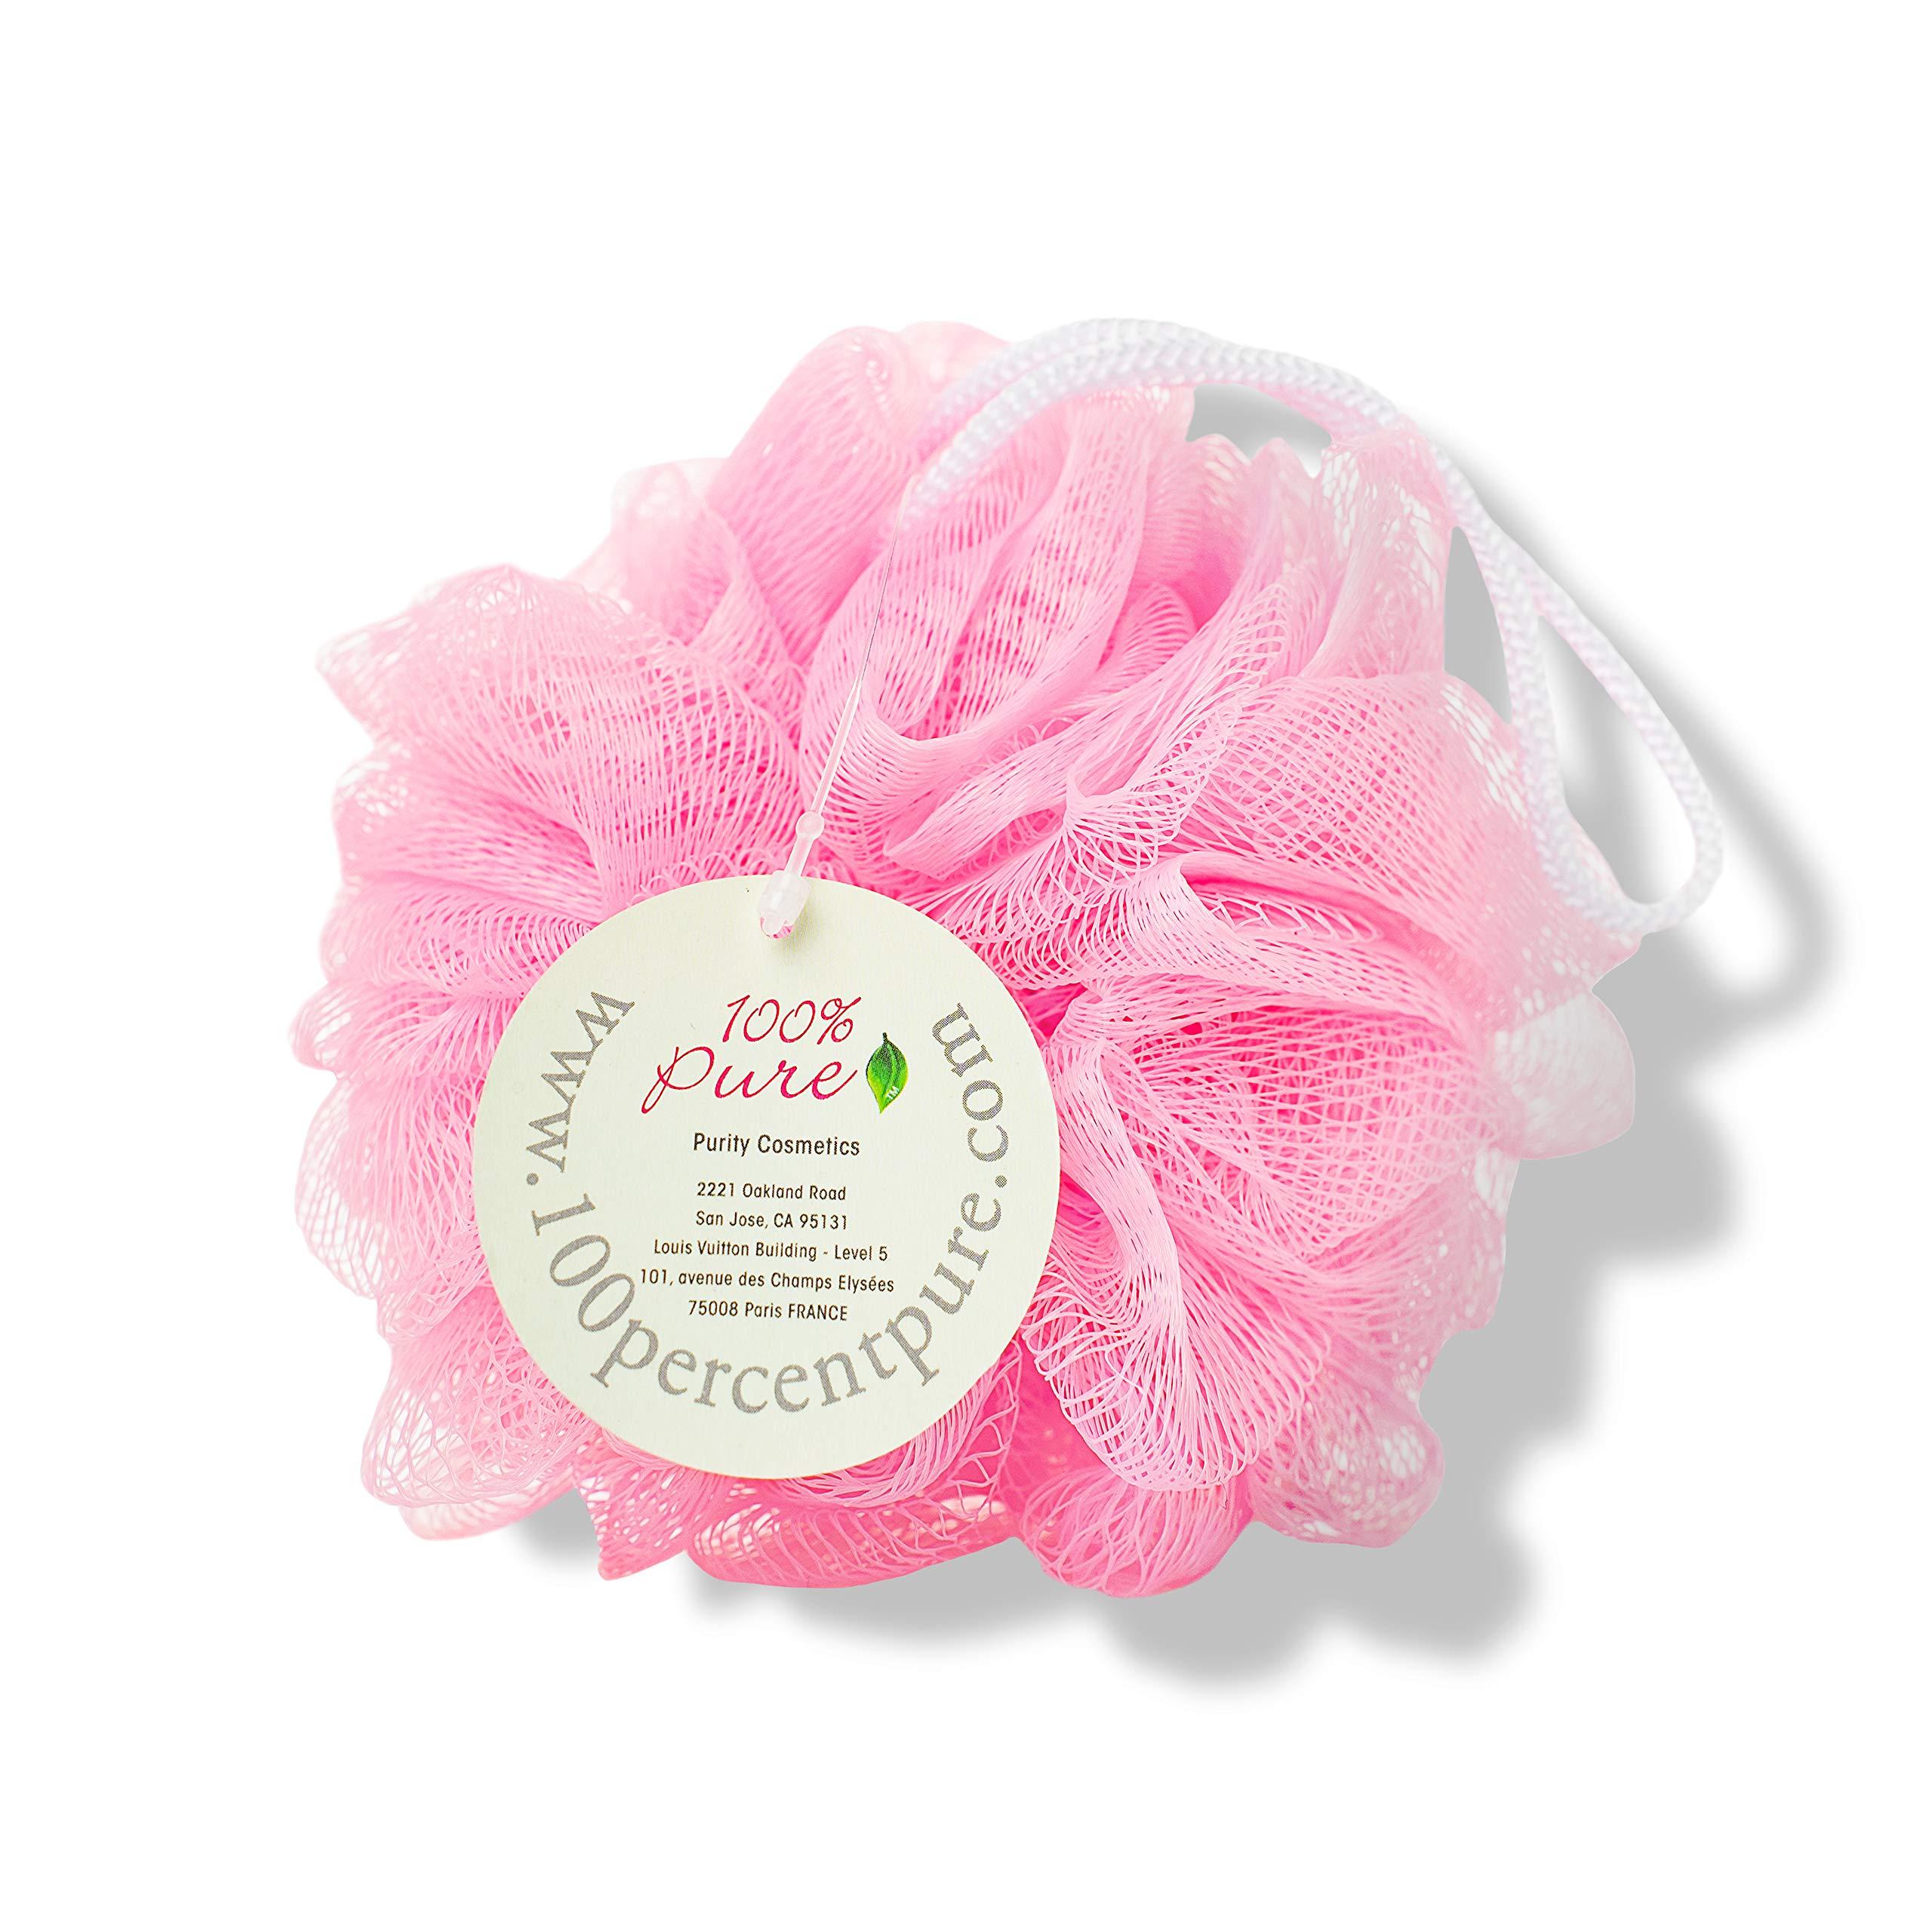 100% PURE Bath Sponge, Exfoliating Body Scrub, Loofah Sponge for Sensitive Skin, 100% Recycled, Body Exfoliator for Bath/Shower - Colors May Vary